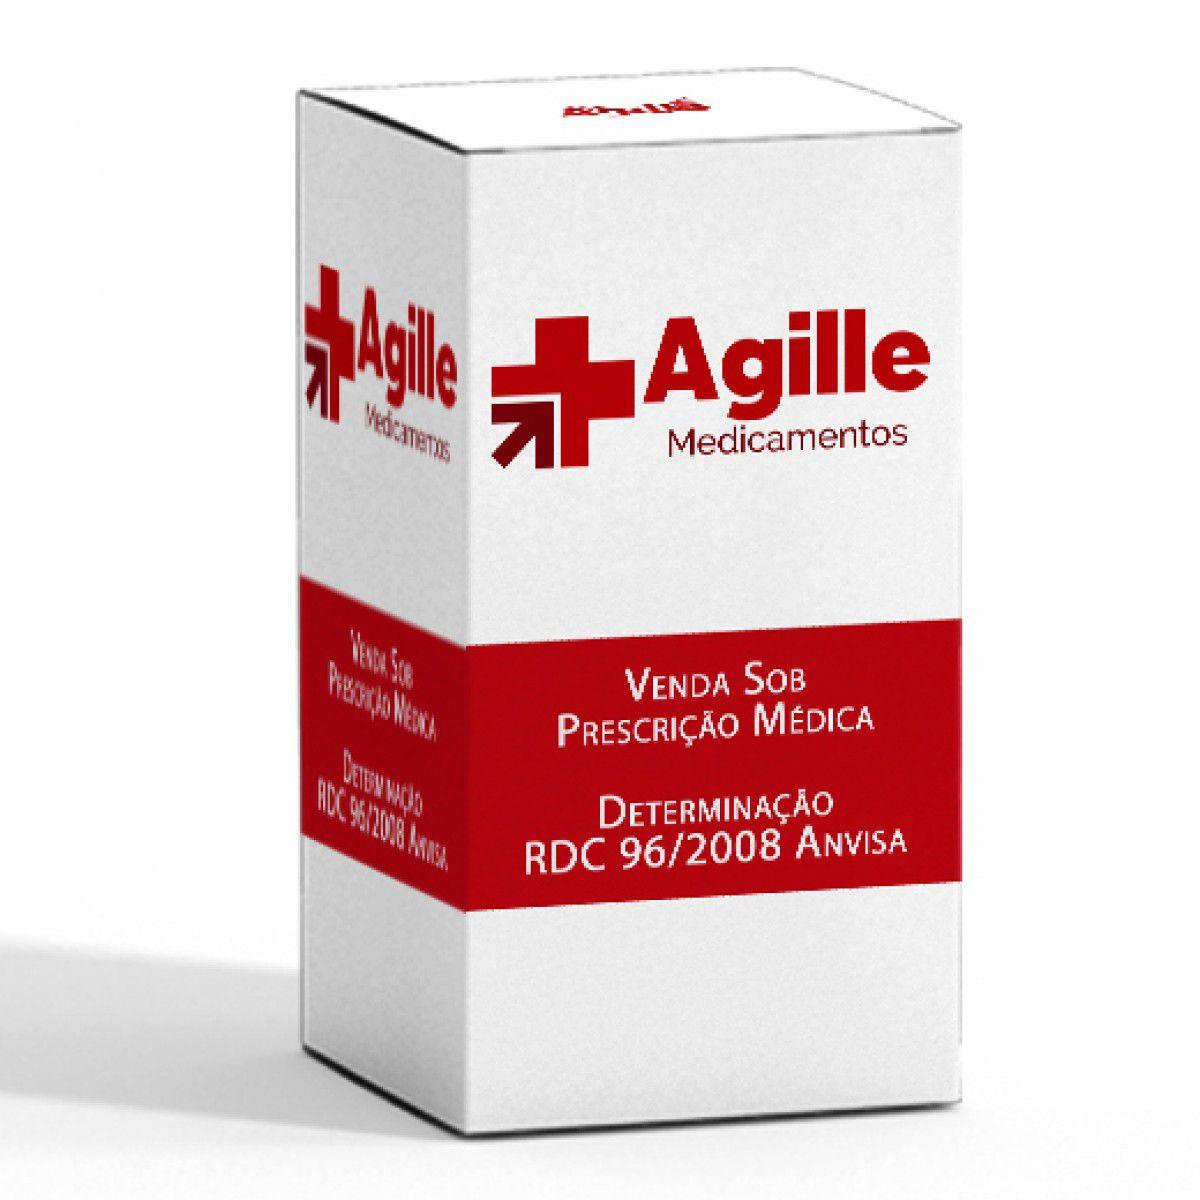 EPREX 4000UI SOL INJ 6 SER PREENCH X 0,4ML+1 DISP  - Agille Speciality